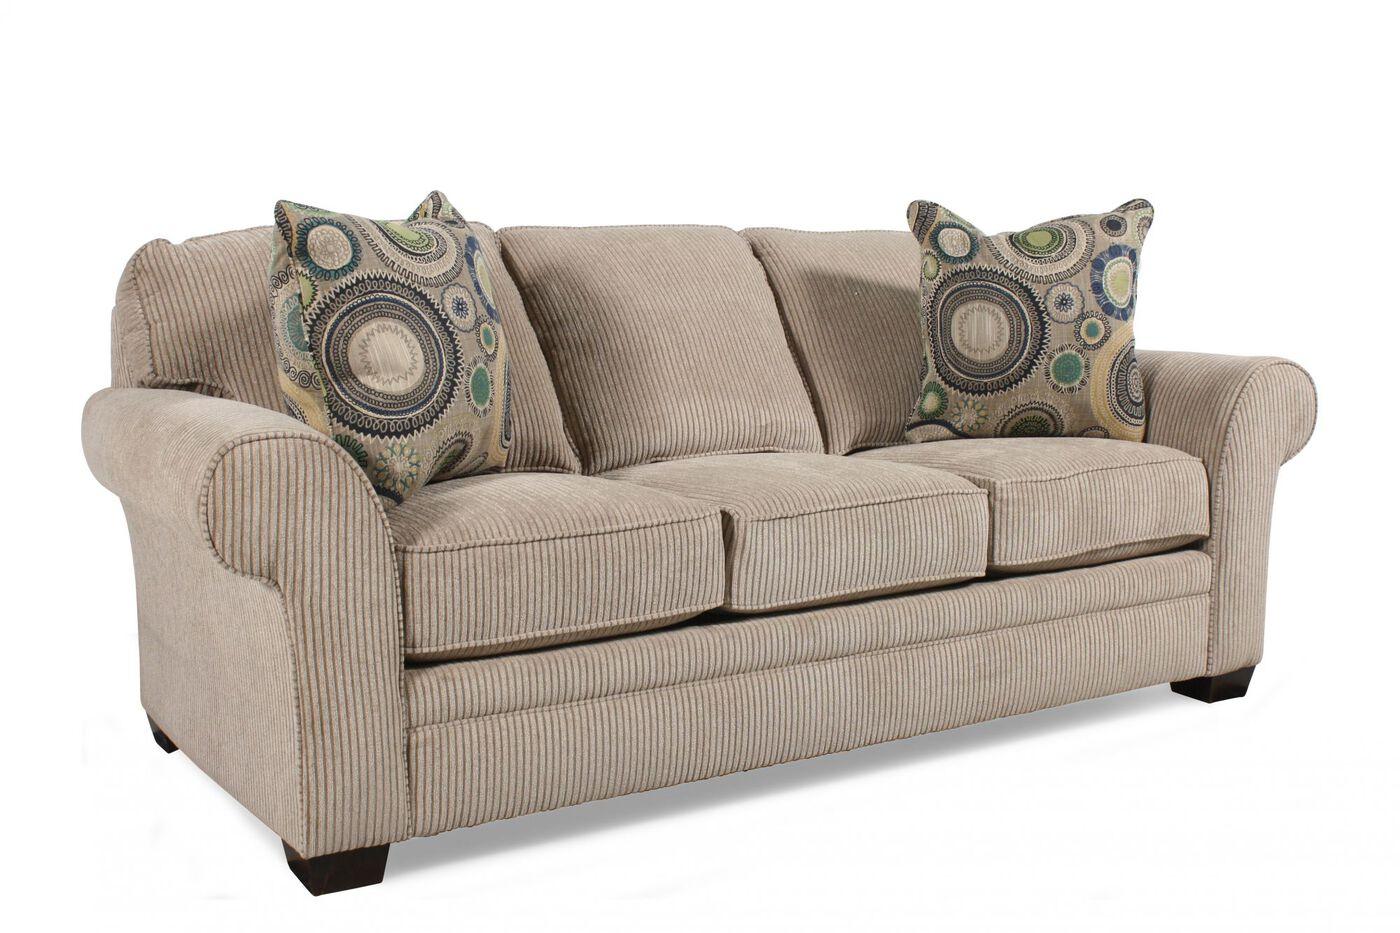 Broyhill Zachary Queen Sleeper Sofa Mathis Brothers